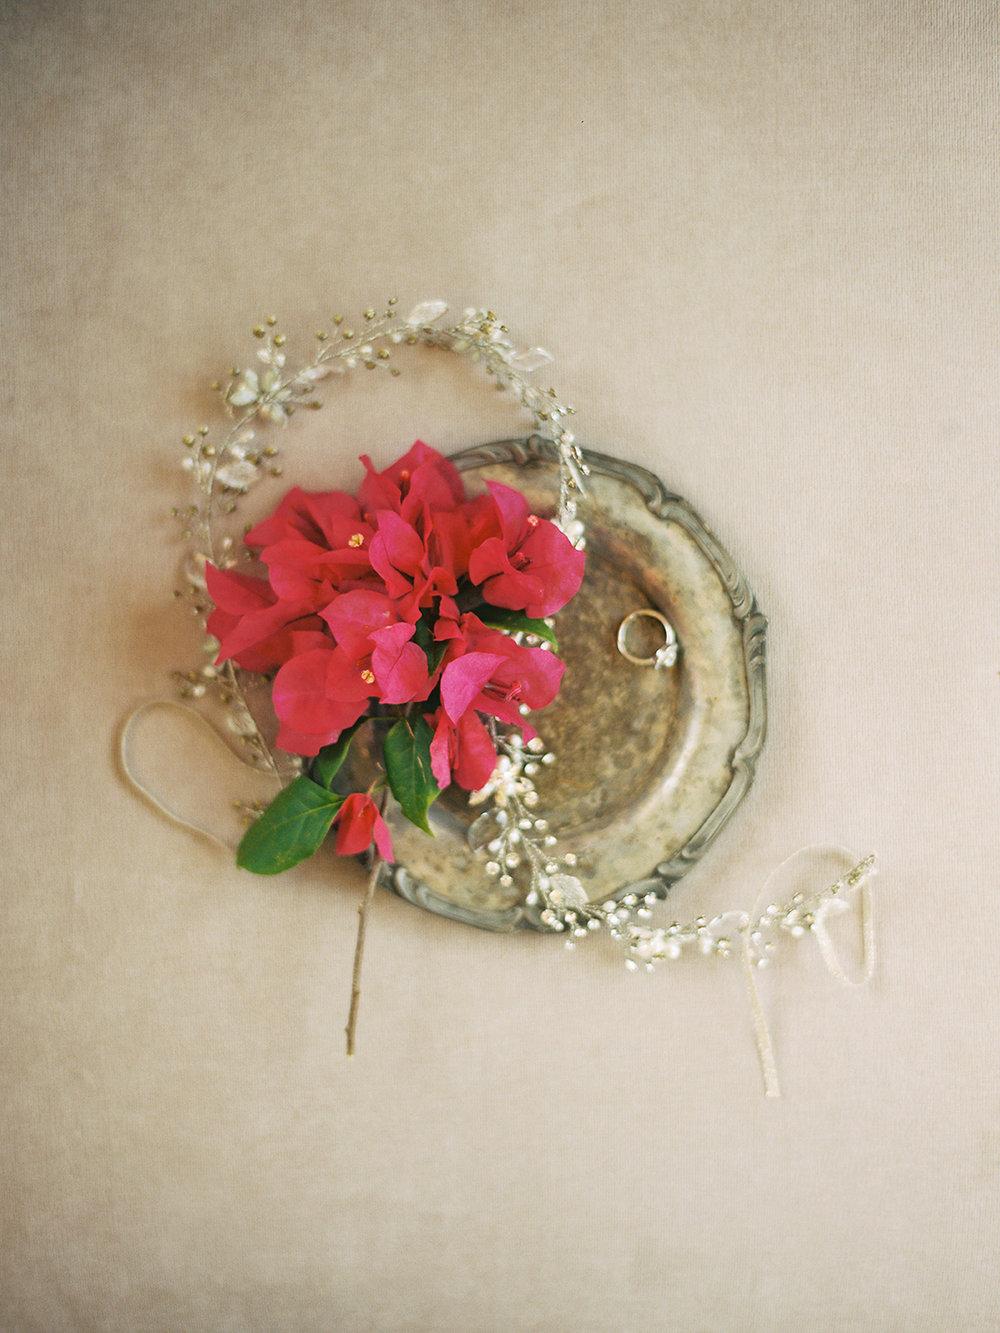 019_Dany+Sarah_Merida_Mexico_Wedding_Brumley & Wells_Fine_art_film_photography.jpg